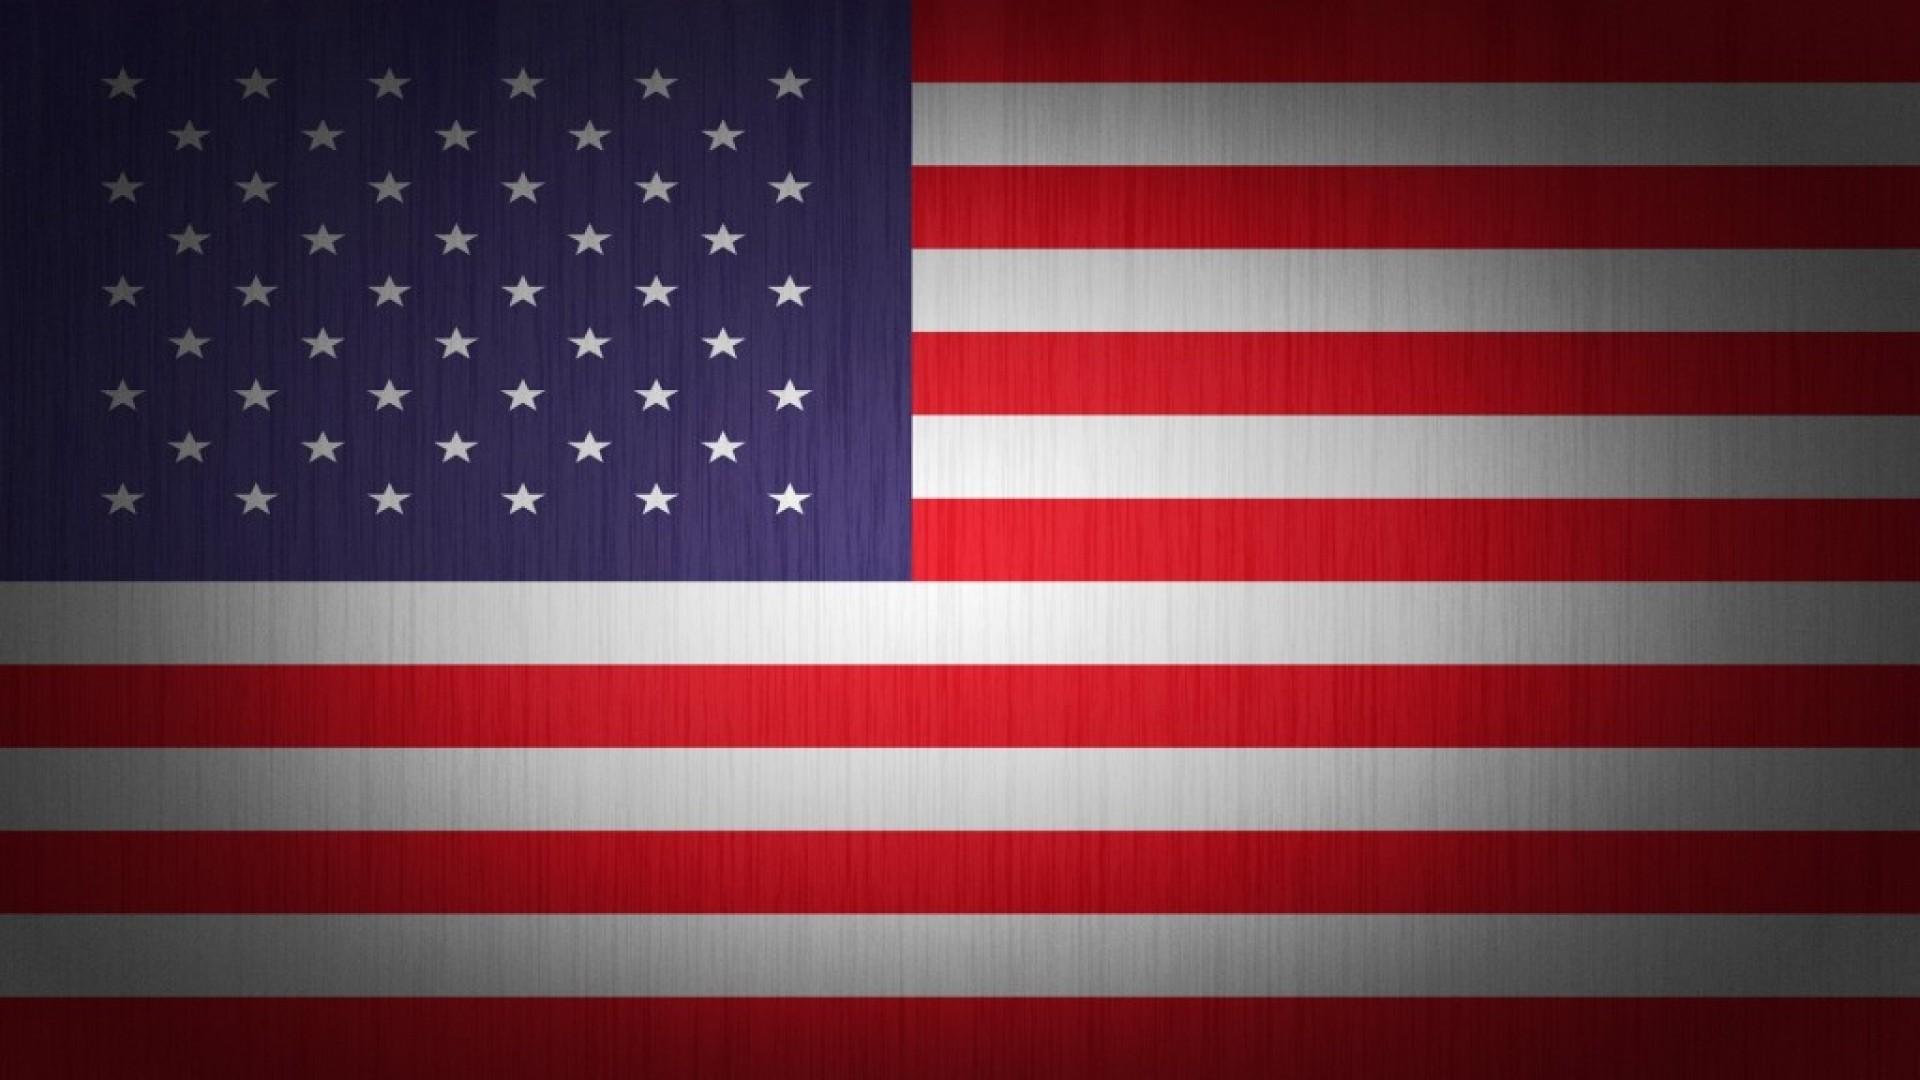 39601175-american-flag-wallpapers -